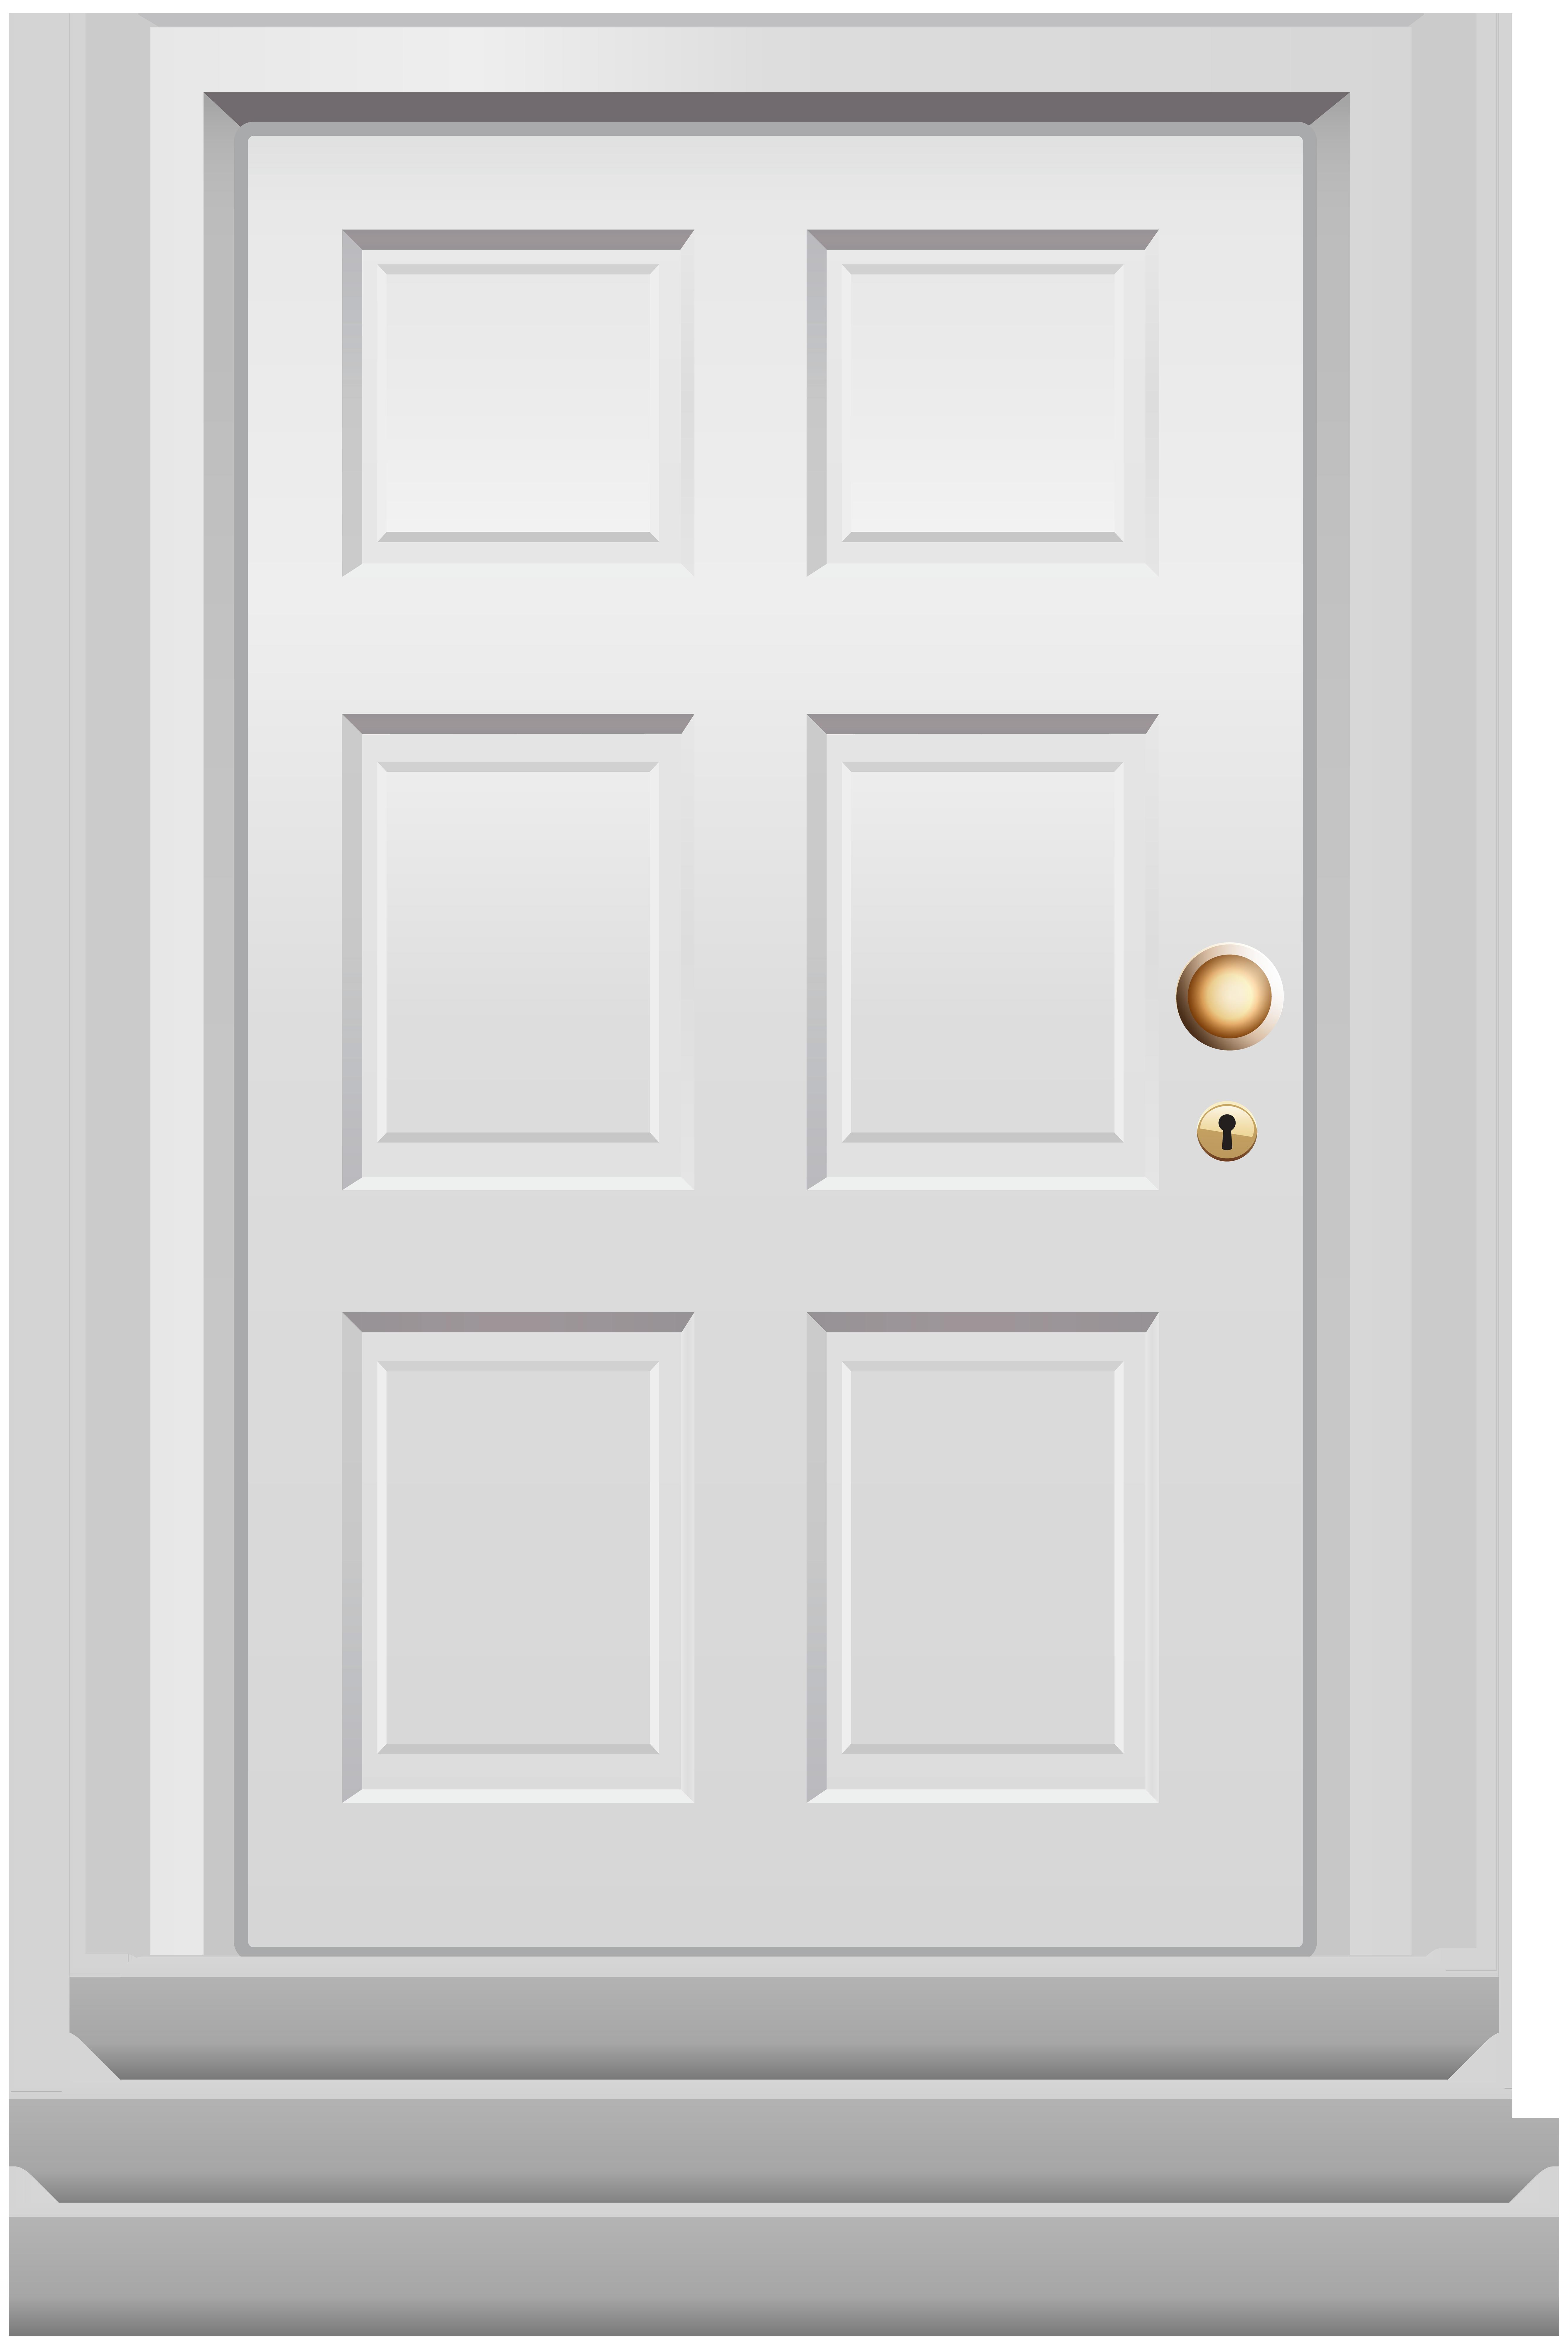 banner download Front white png clip. Door clipart.